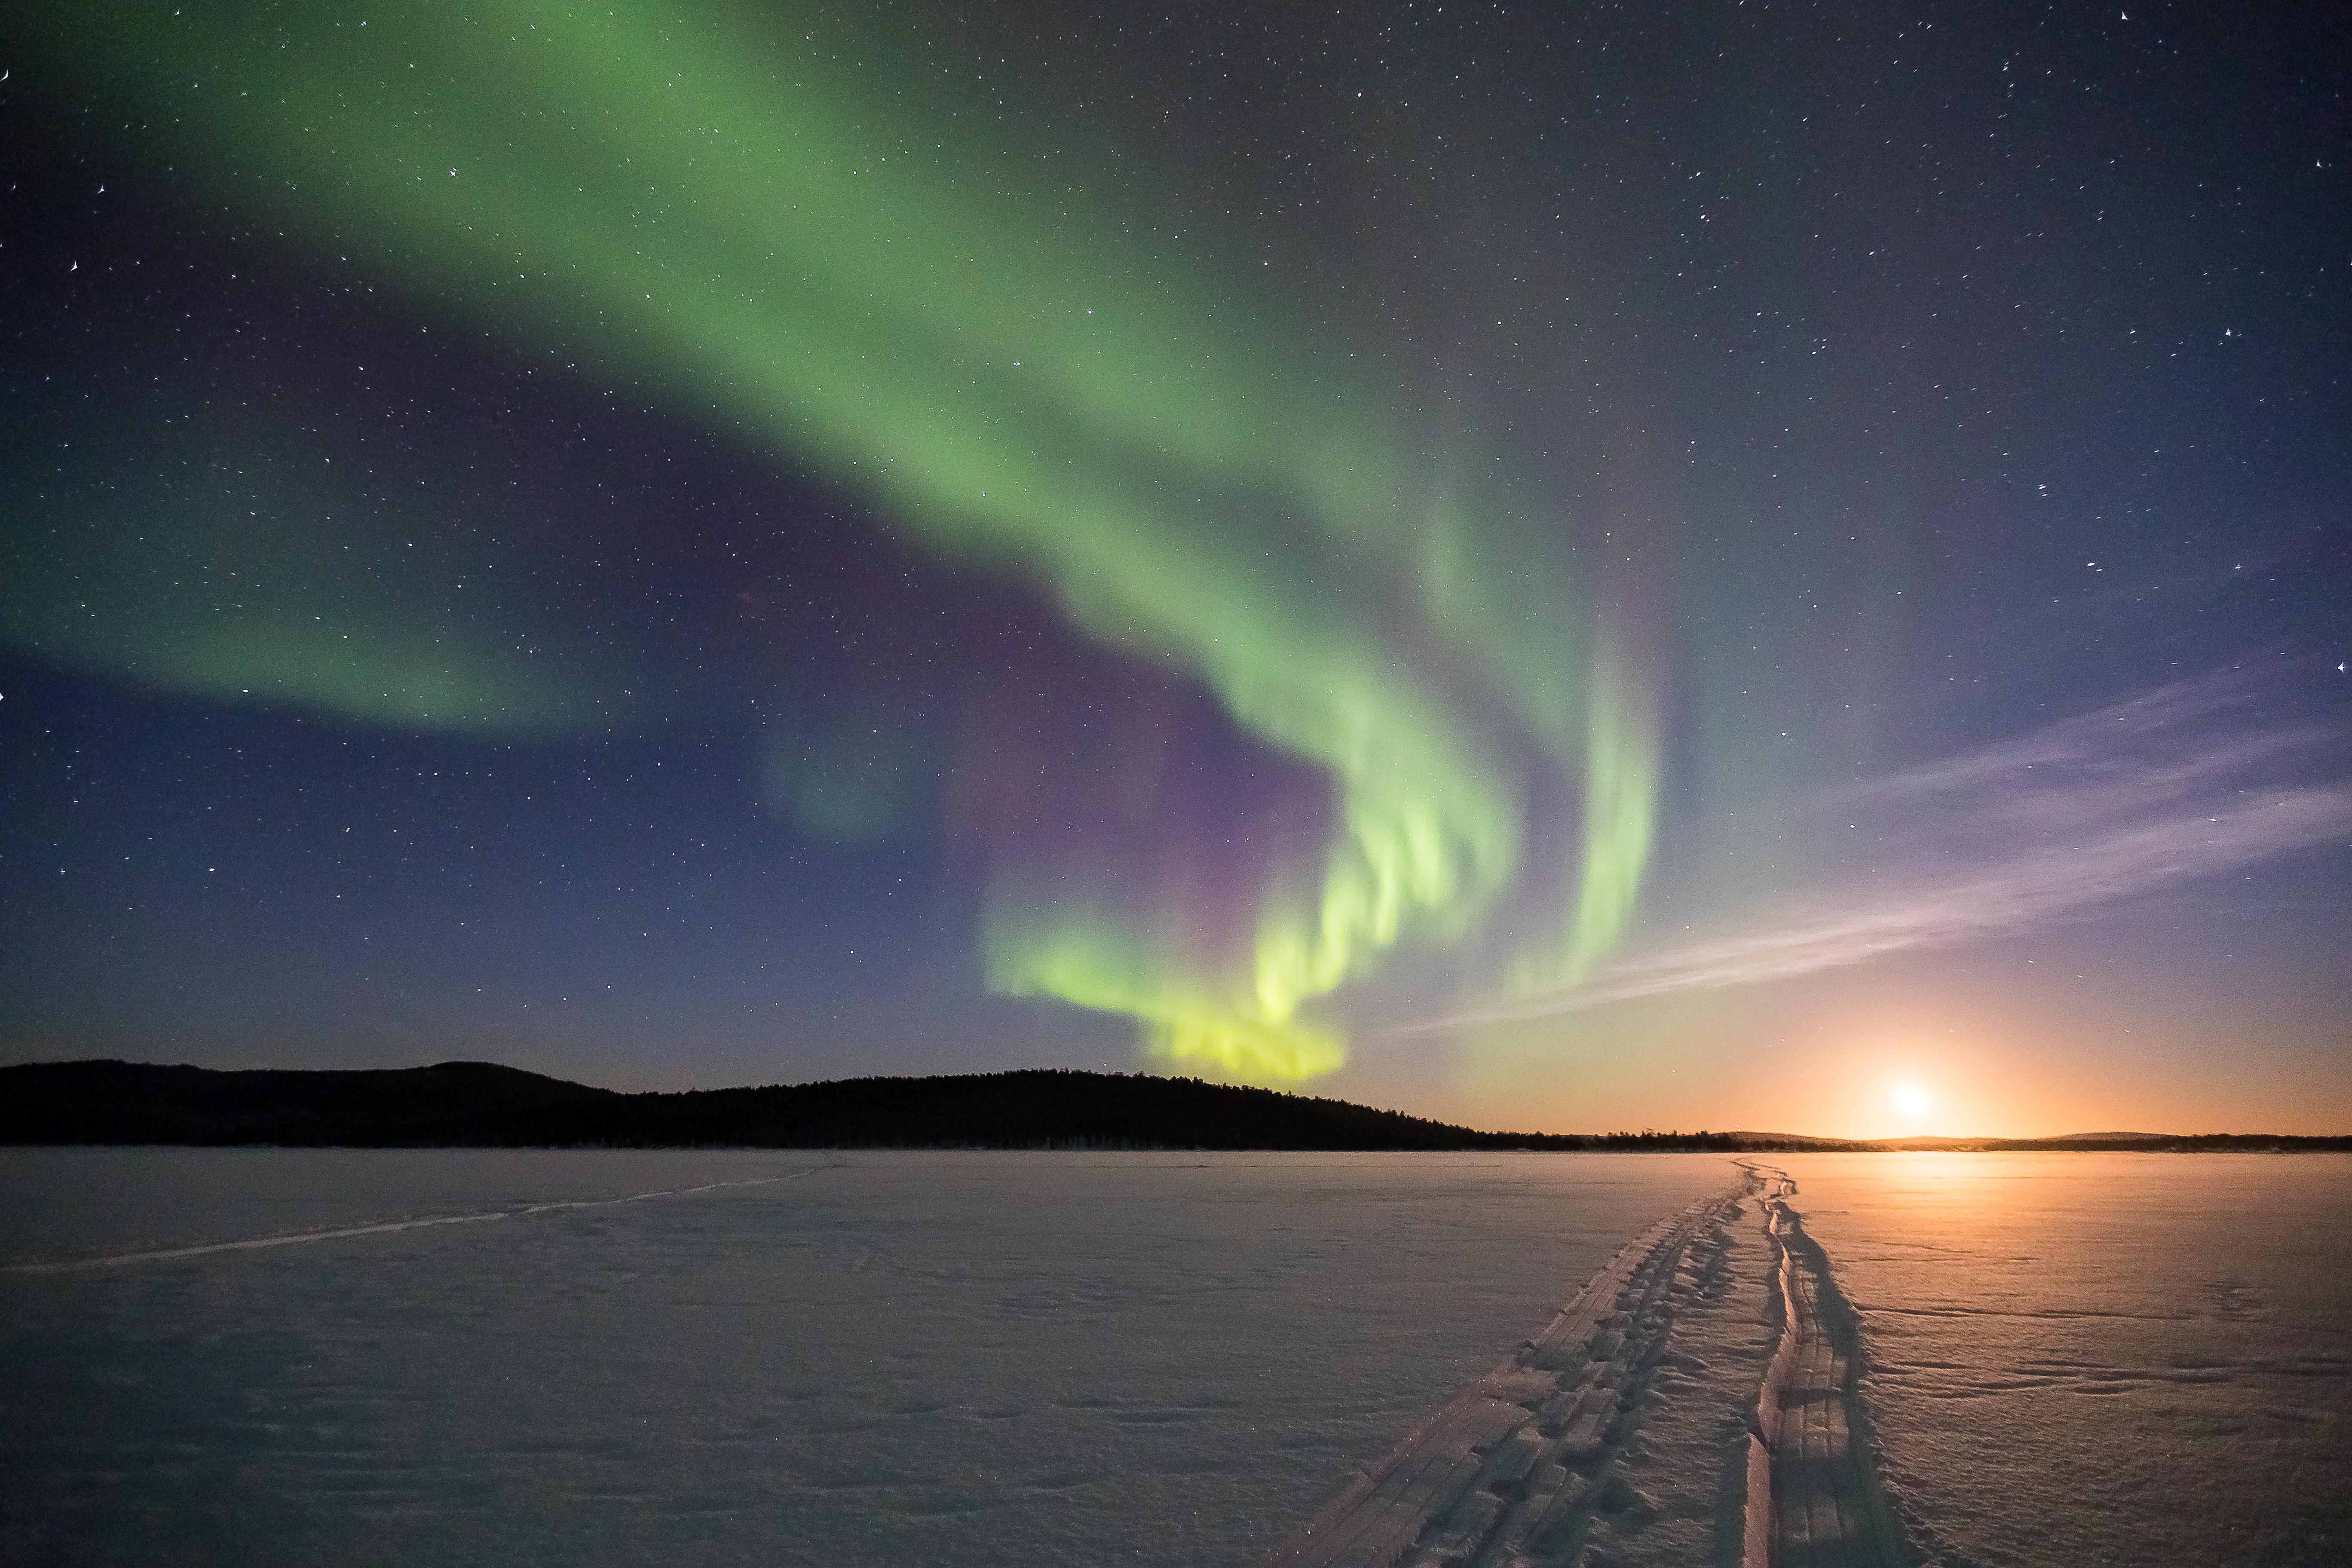 Northern-lights-winter_Rayann-Elzein_Lapland-Material-Bank